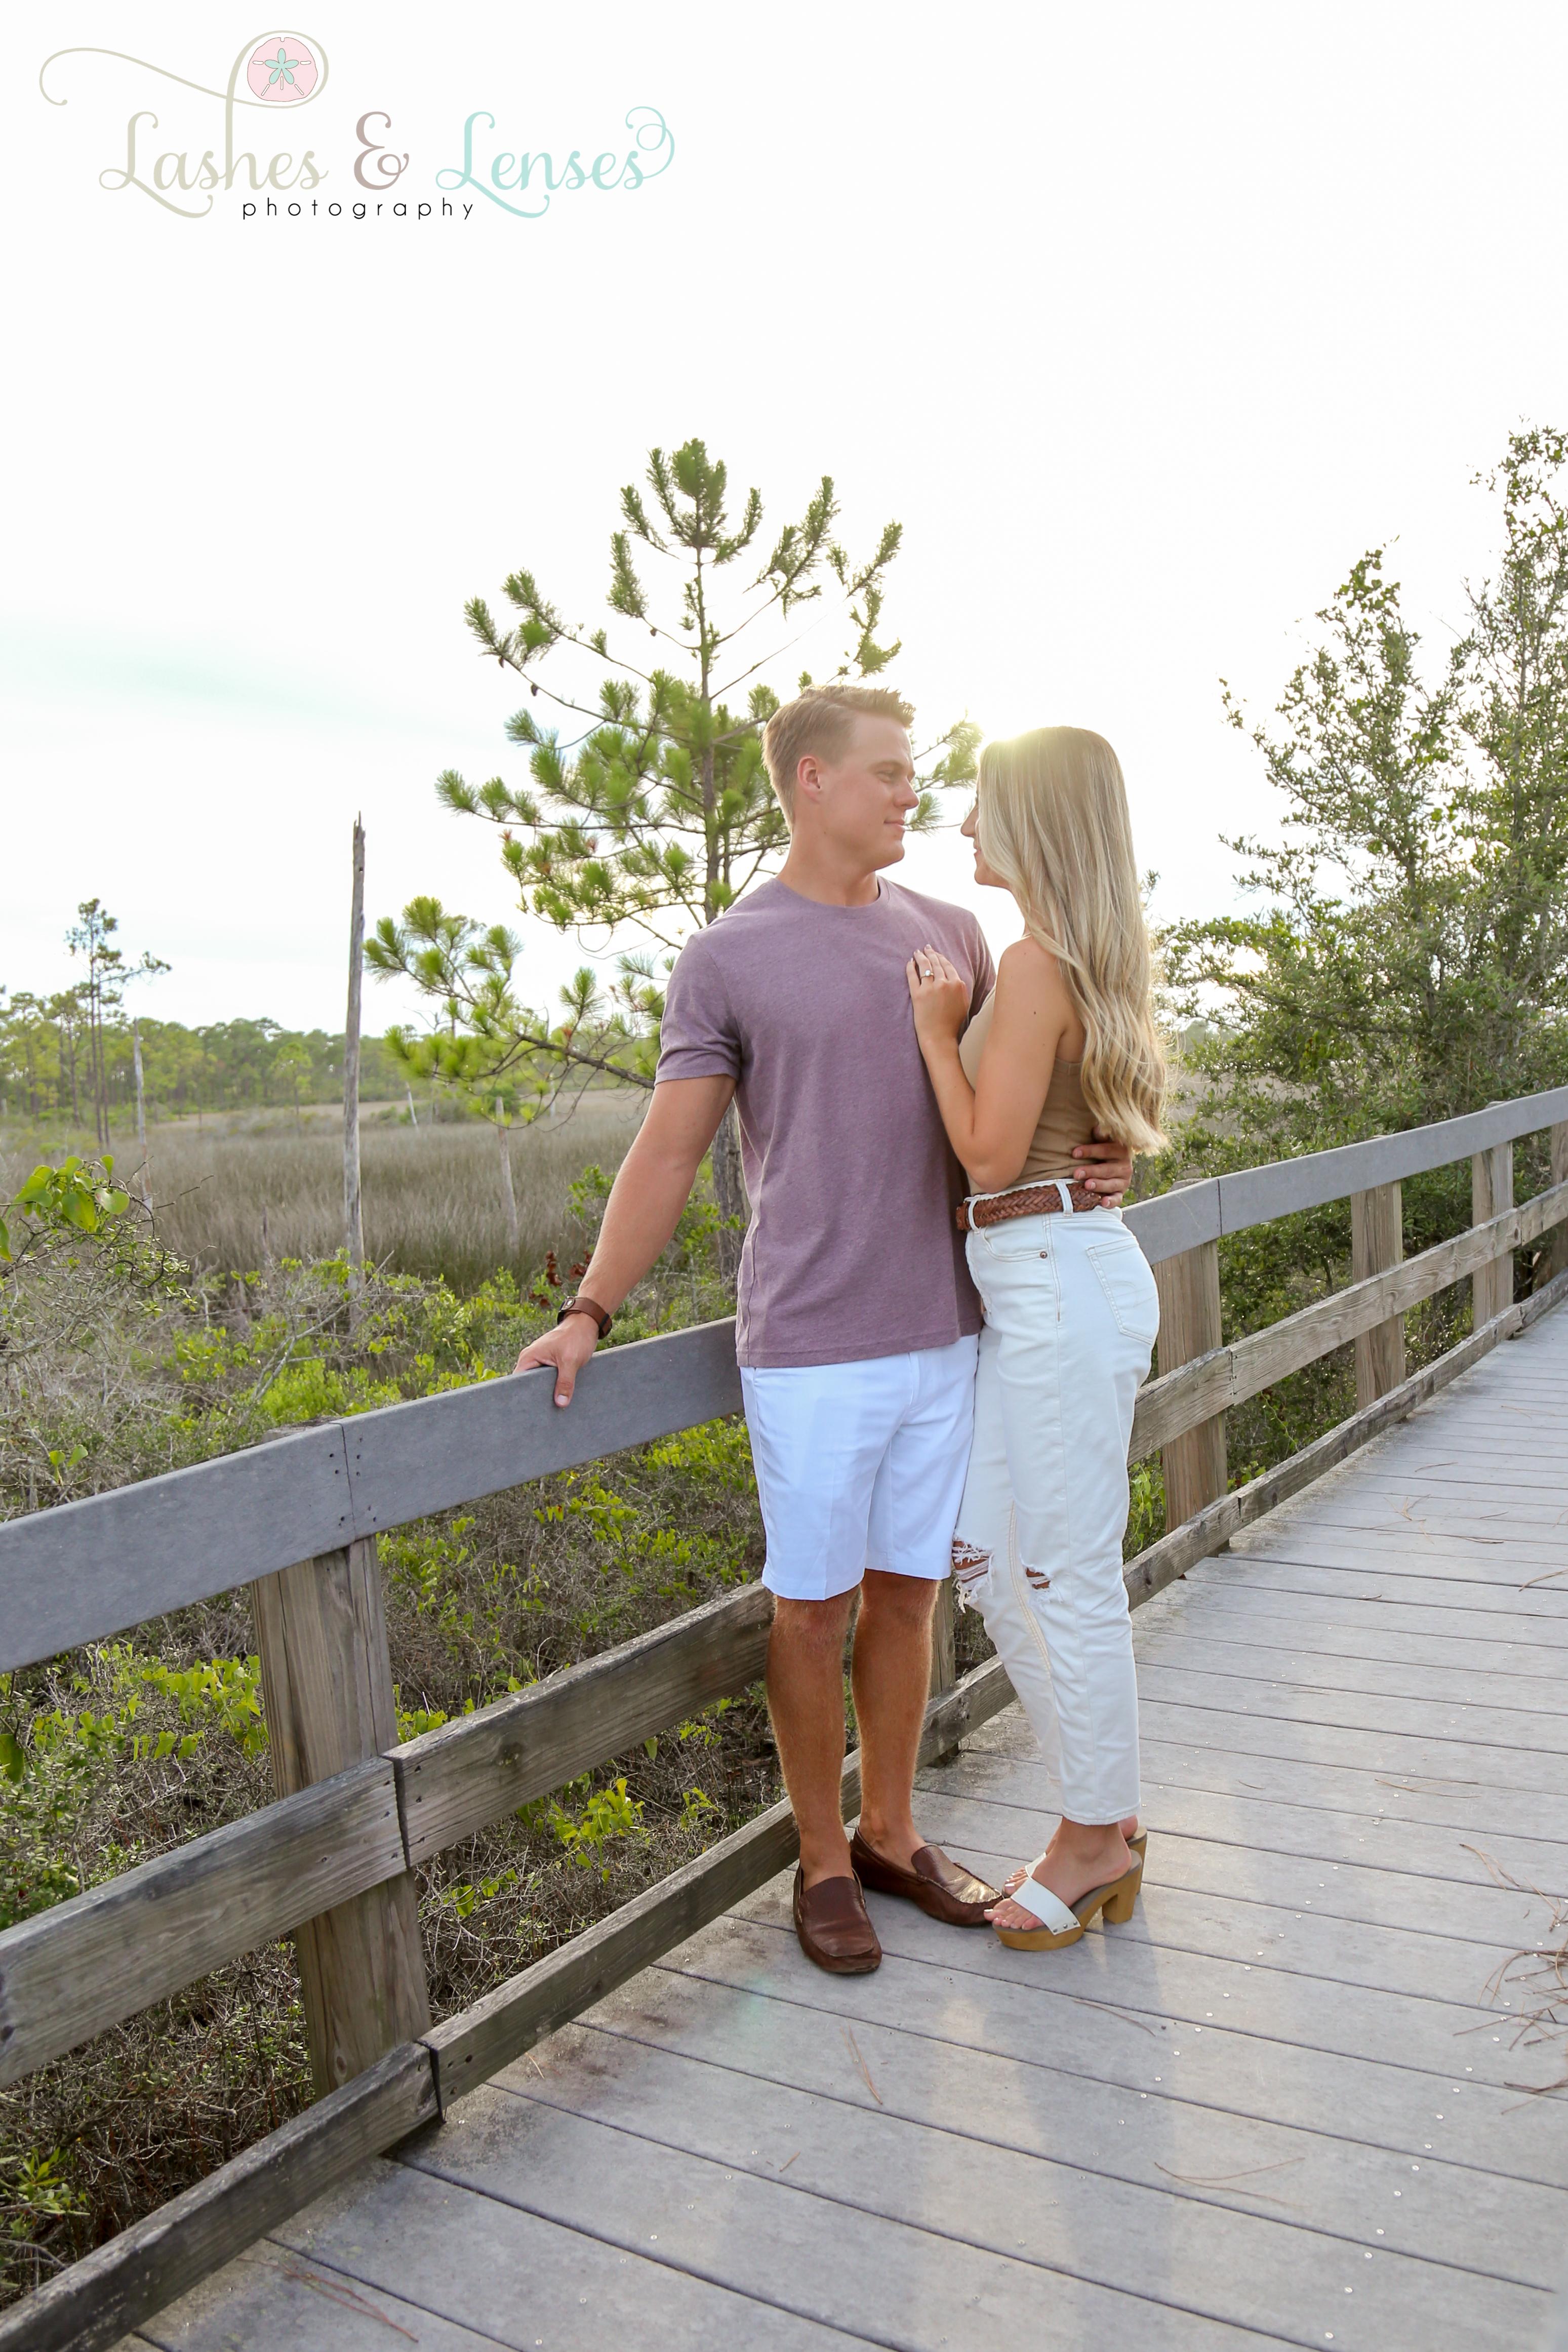 Engaged couple on nature trail at Johnsons Beach Perdido Key